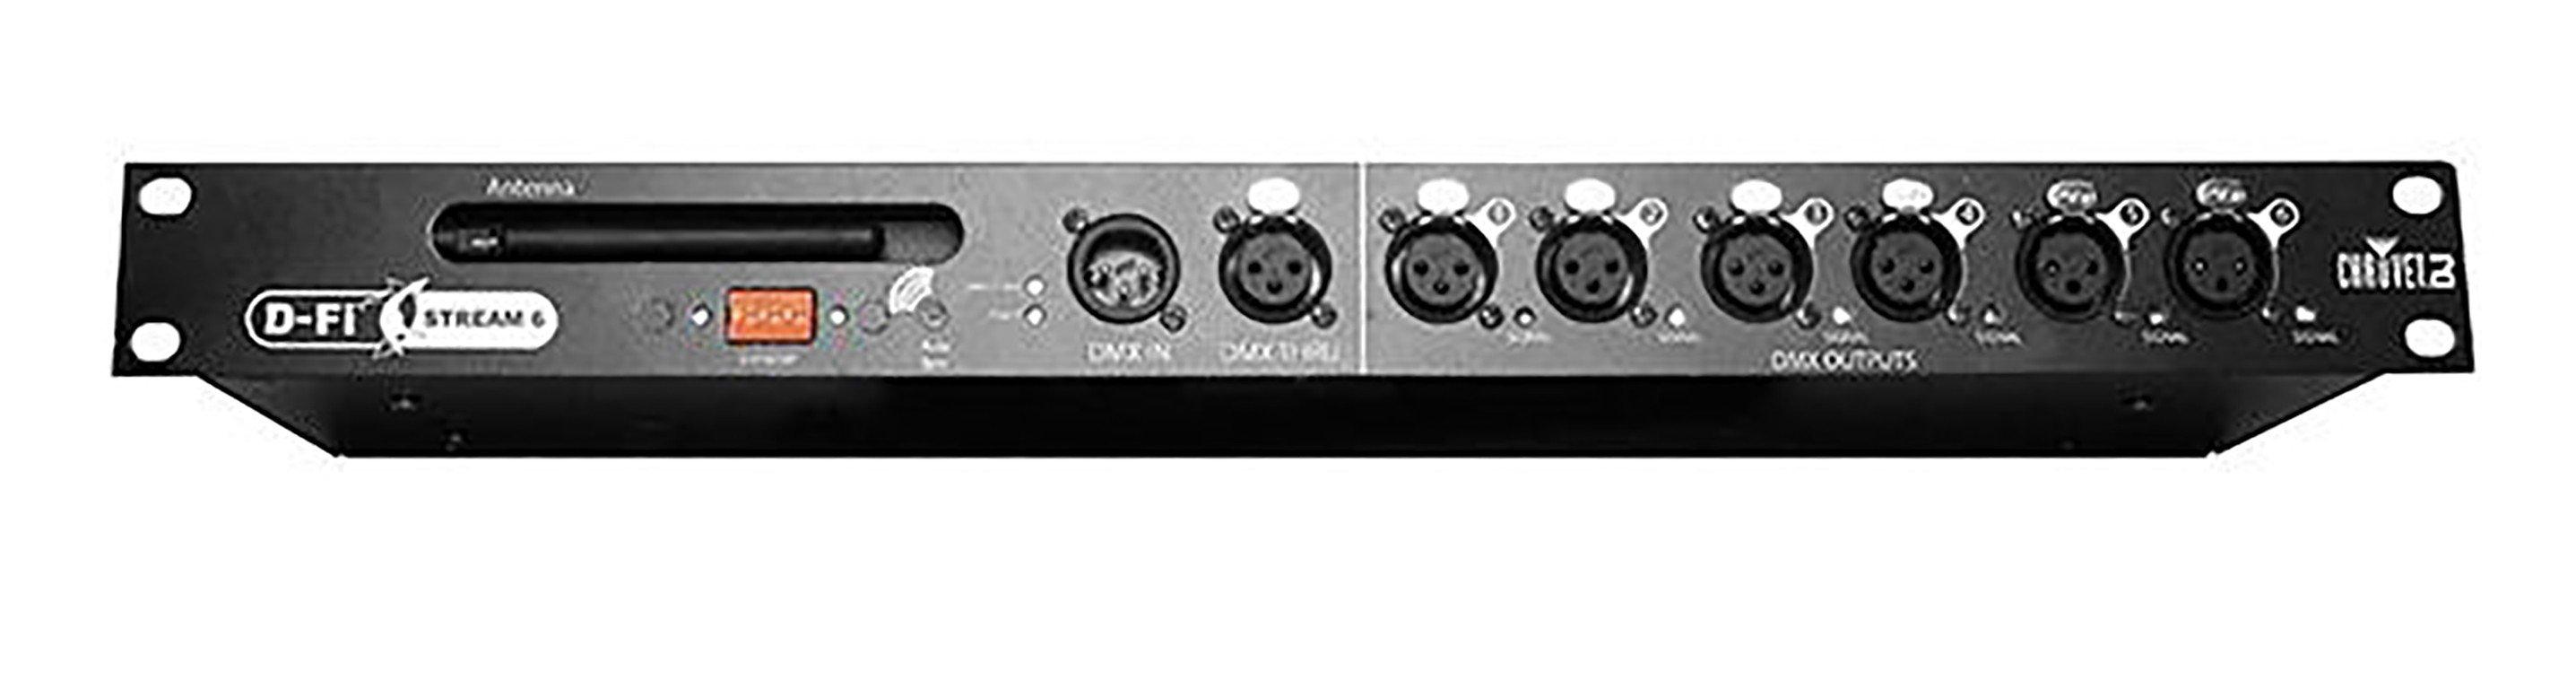 Chauvet D-Fi Stream 6